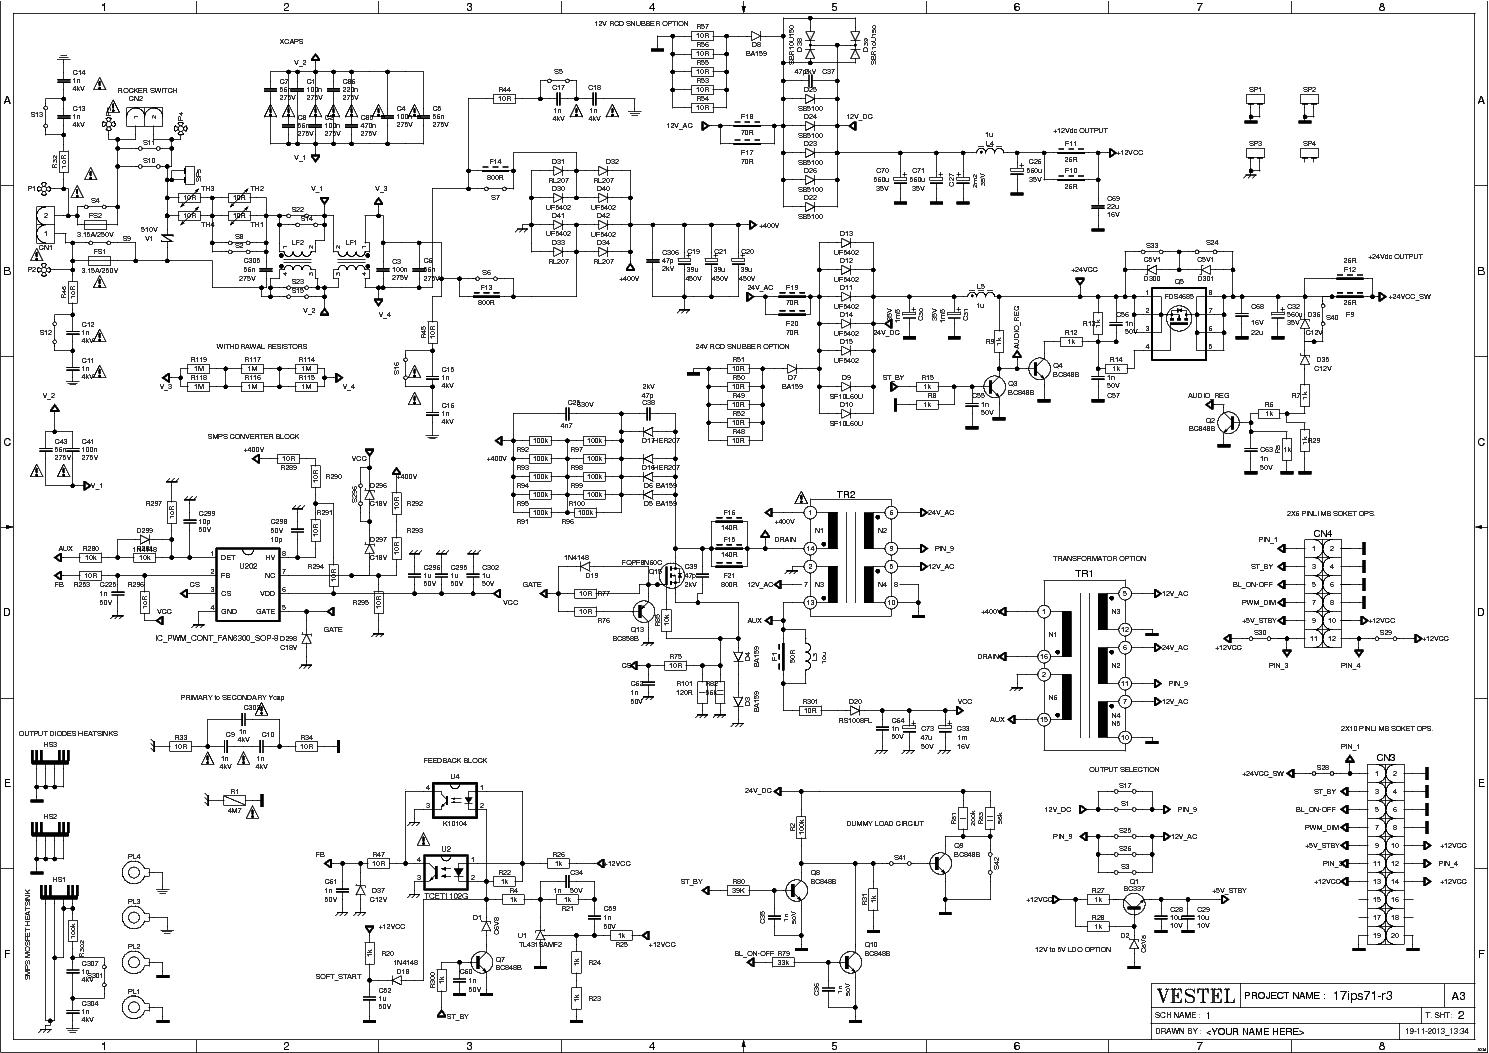 17pw26 4 circuit diagram trusted schematics wiring diagrams u2022 rh bestbooksrichtreasures com